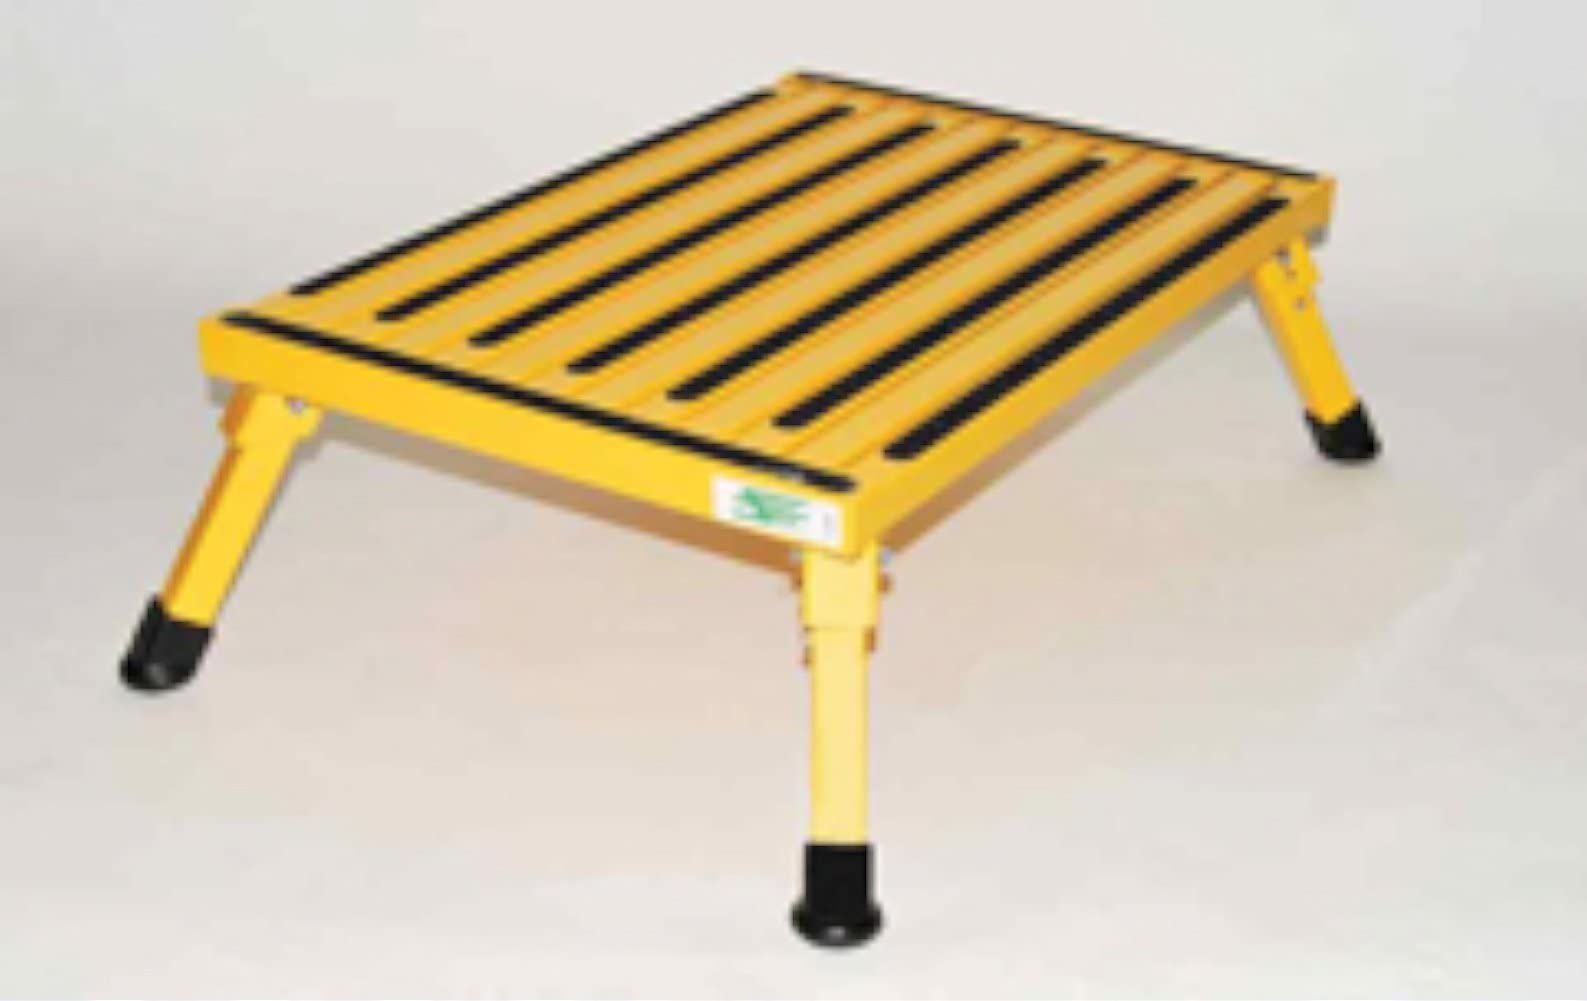 Safety Step XL-08C-Y Yellow X-Large Folding Recreational Step Stool  sc 1 st  Amazon.com & Kidsu0027 Step Stools | Amazon.com islam-shia.org